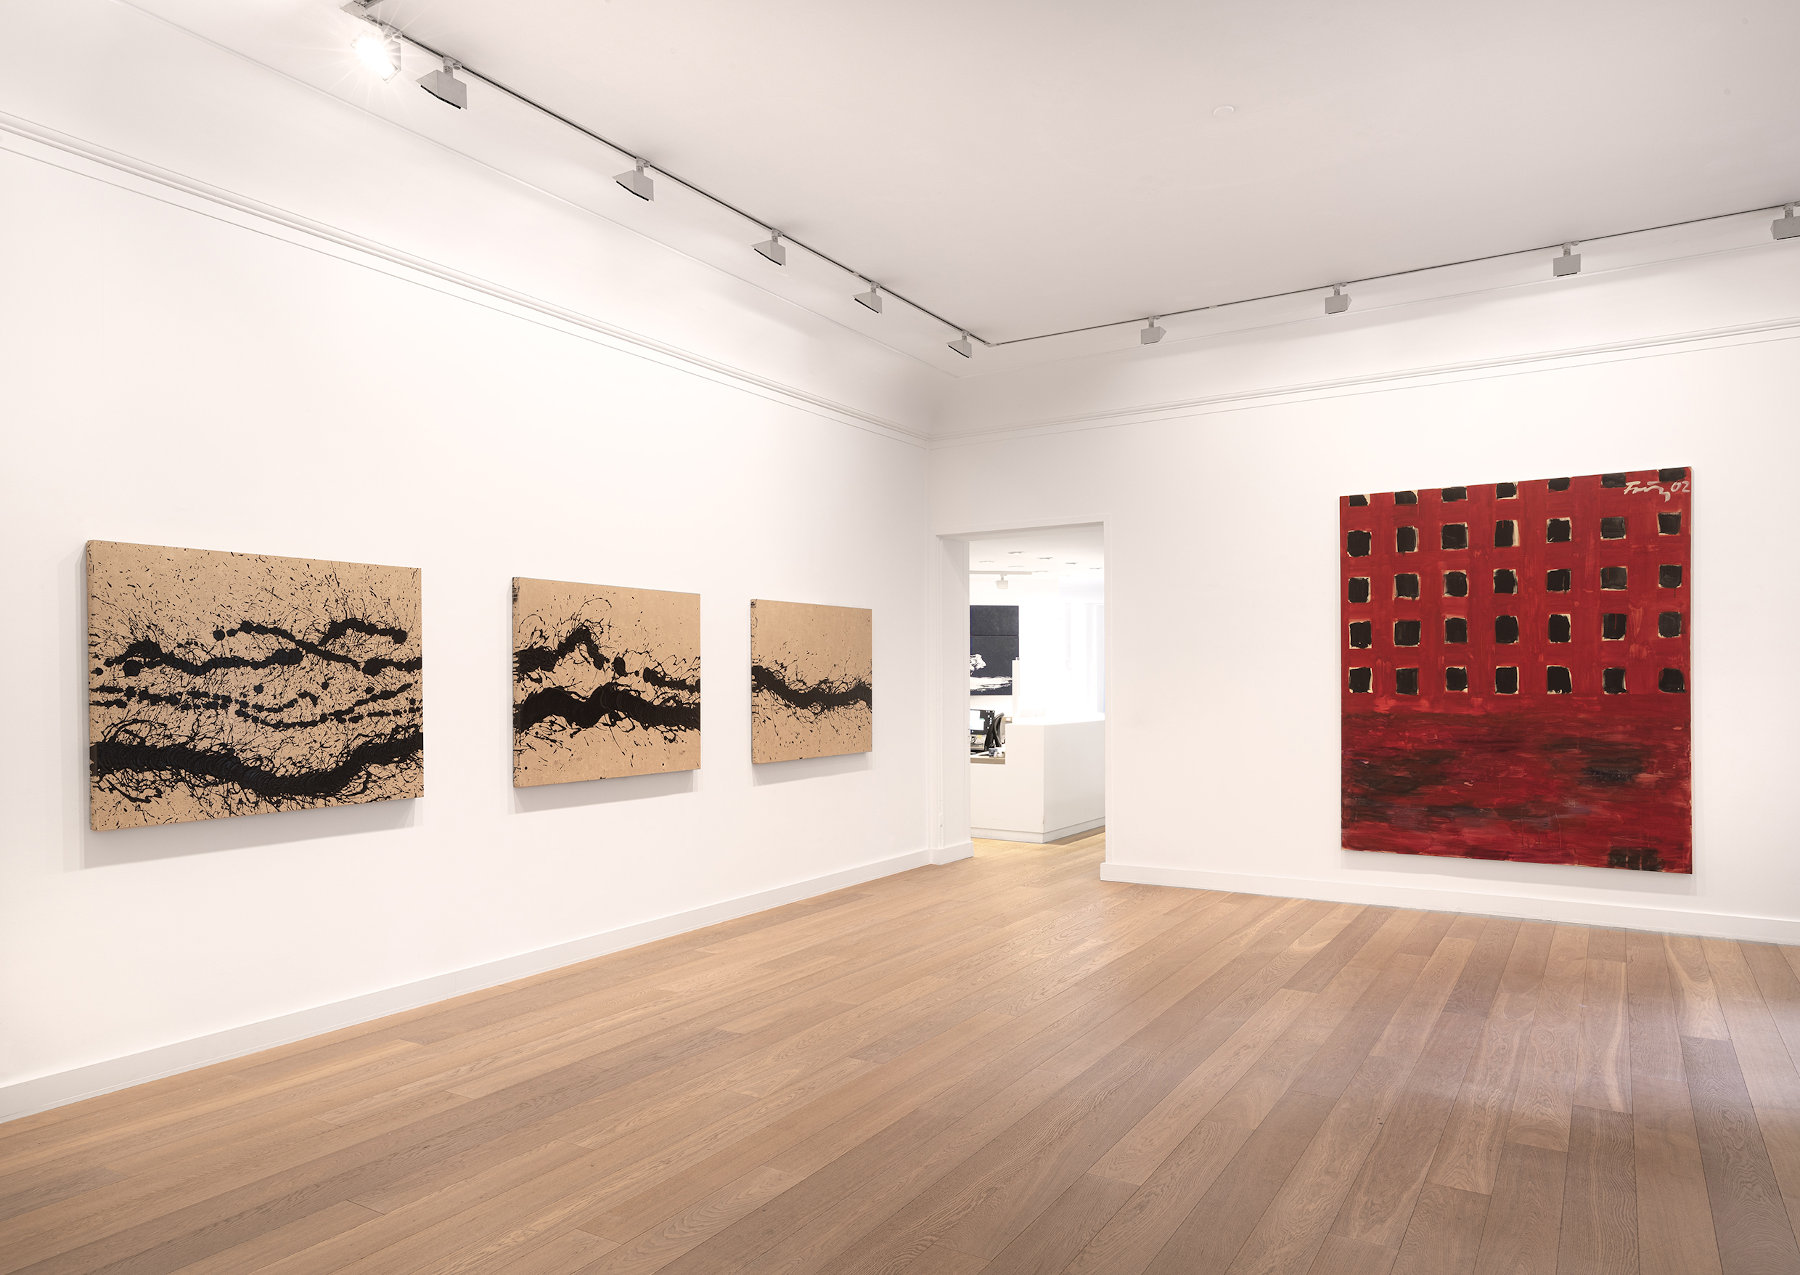 Galerie Lelong Rhythms Vibrations 1